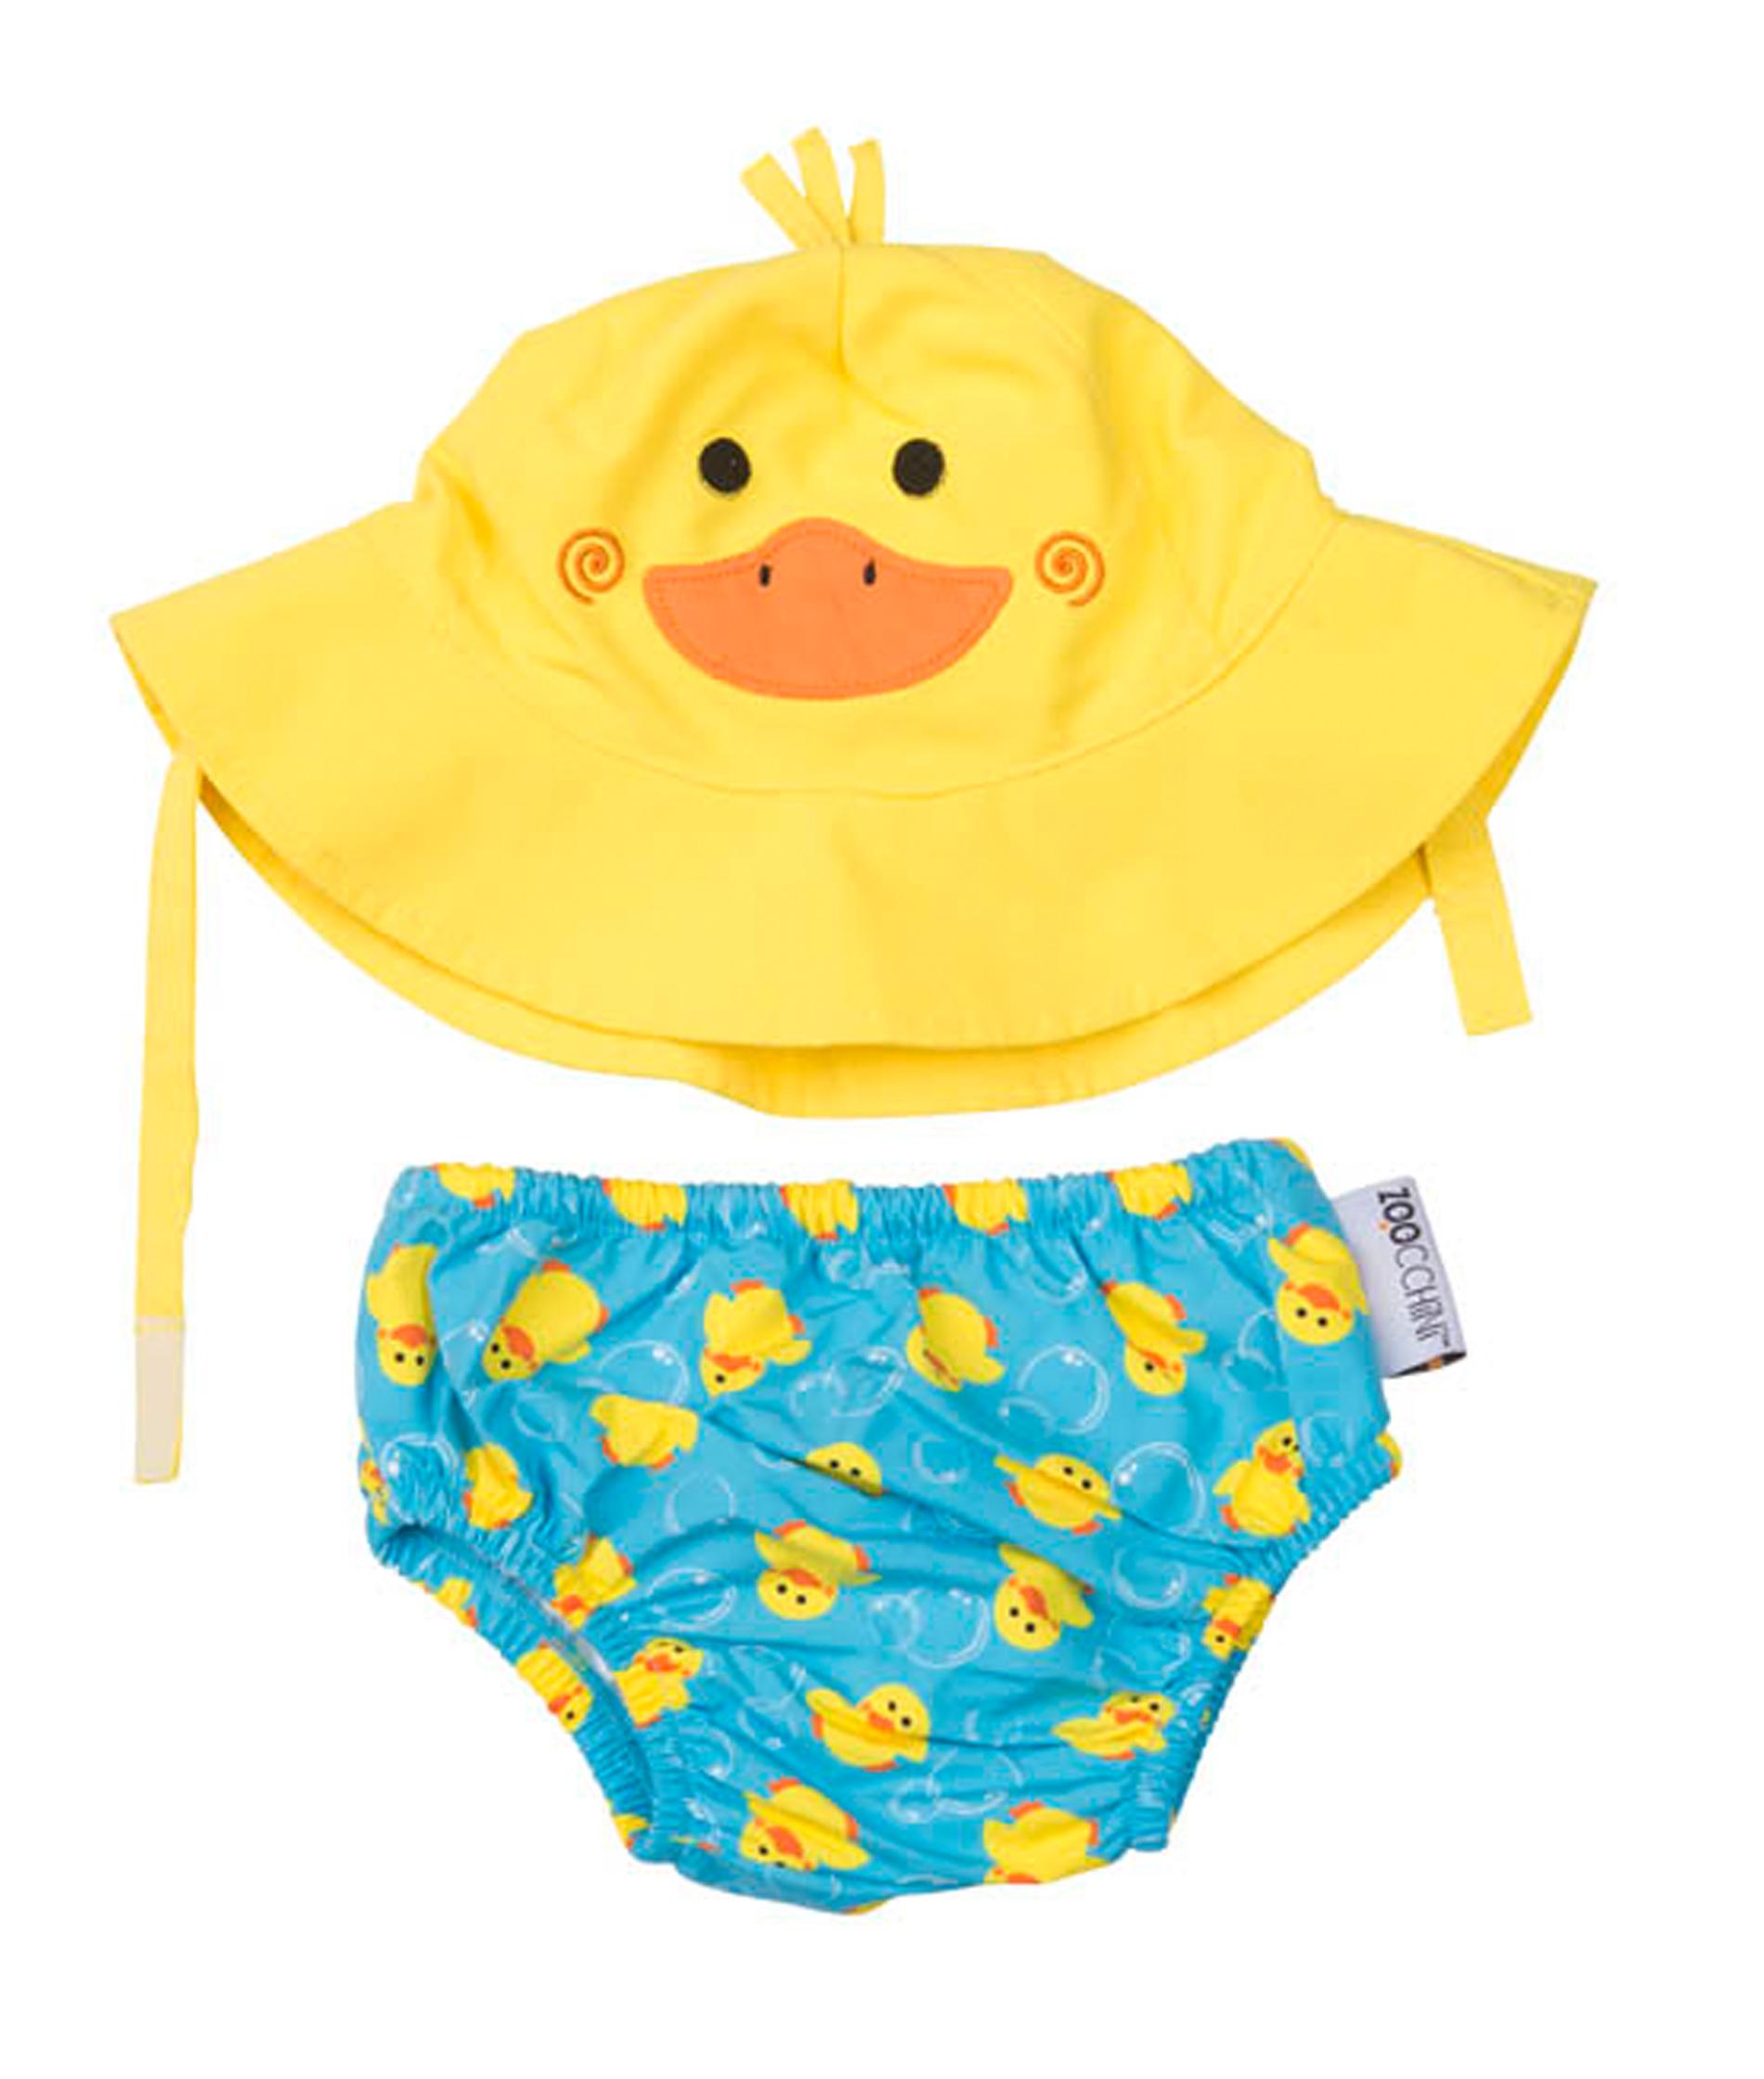 Zoocchini Baby Swim Diaper & Sun Hat Set - Duck